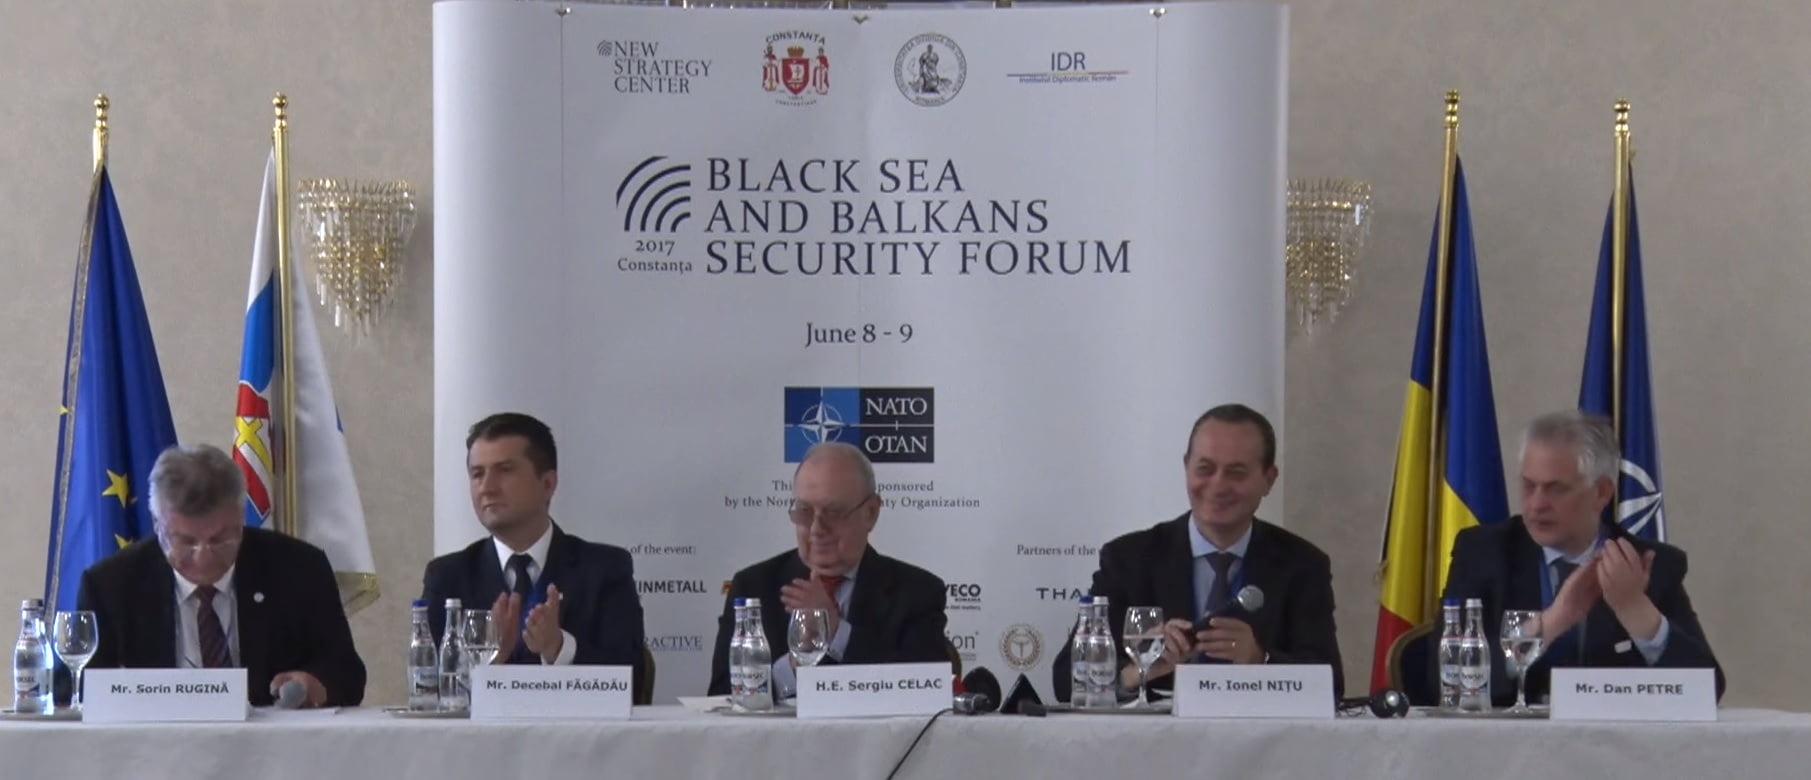 blak sea and balkans security forum fagadau